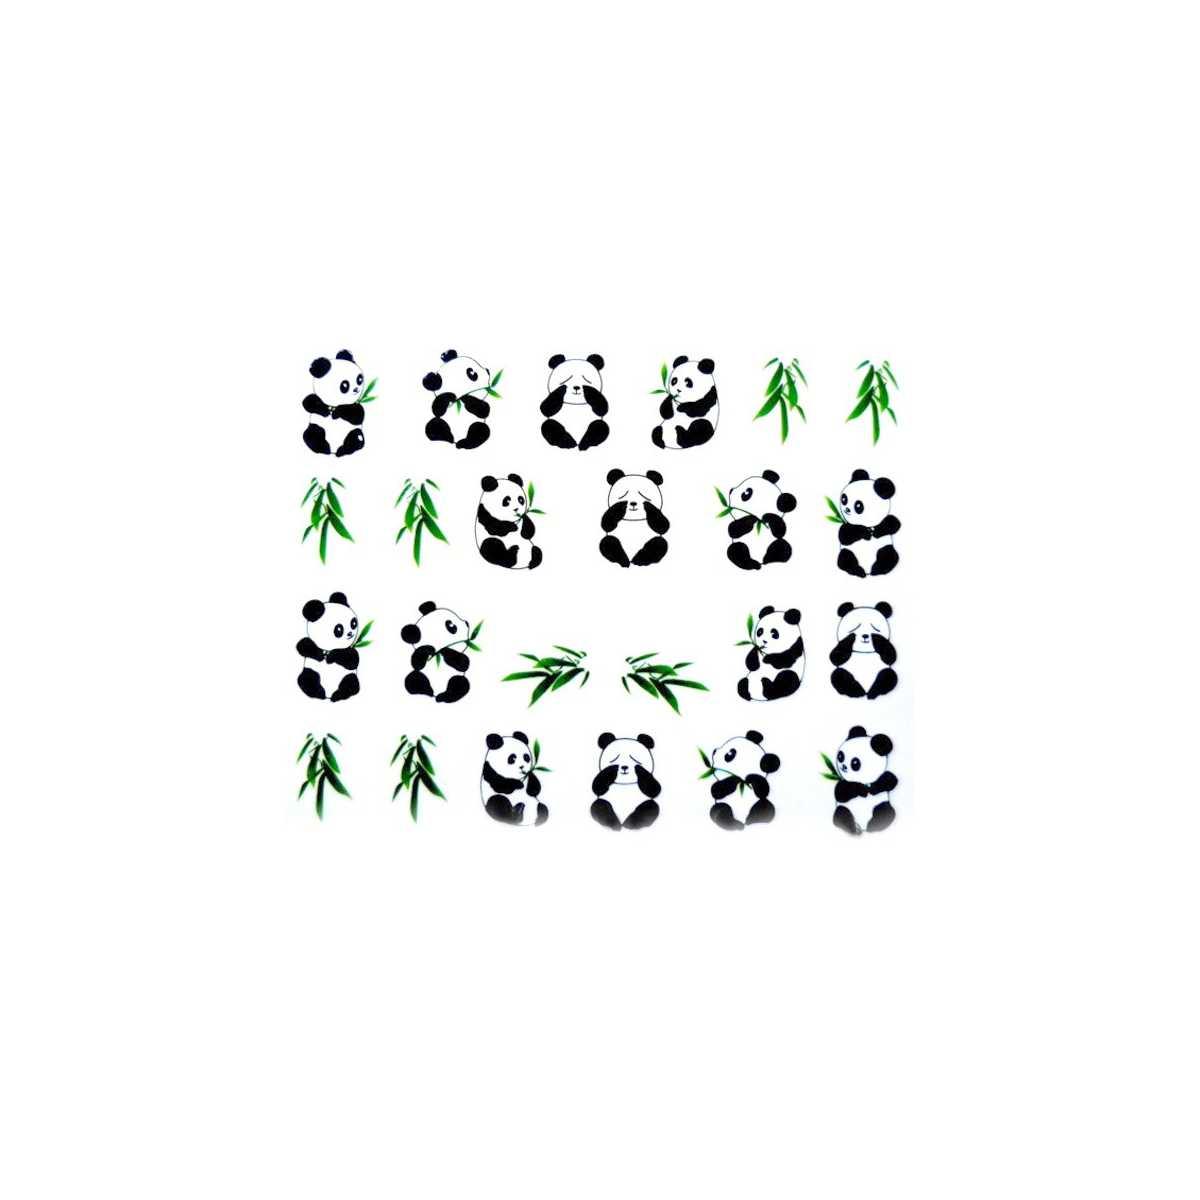 https://www.kit-manucure.com/2021-thickbox_default/water-decals-panda-noir-et-blanc-et-bambou.jpg